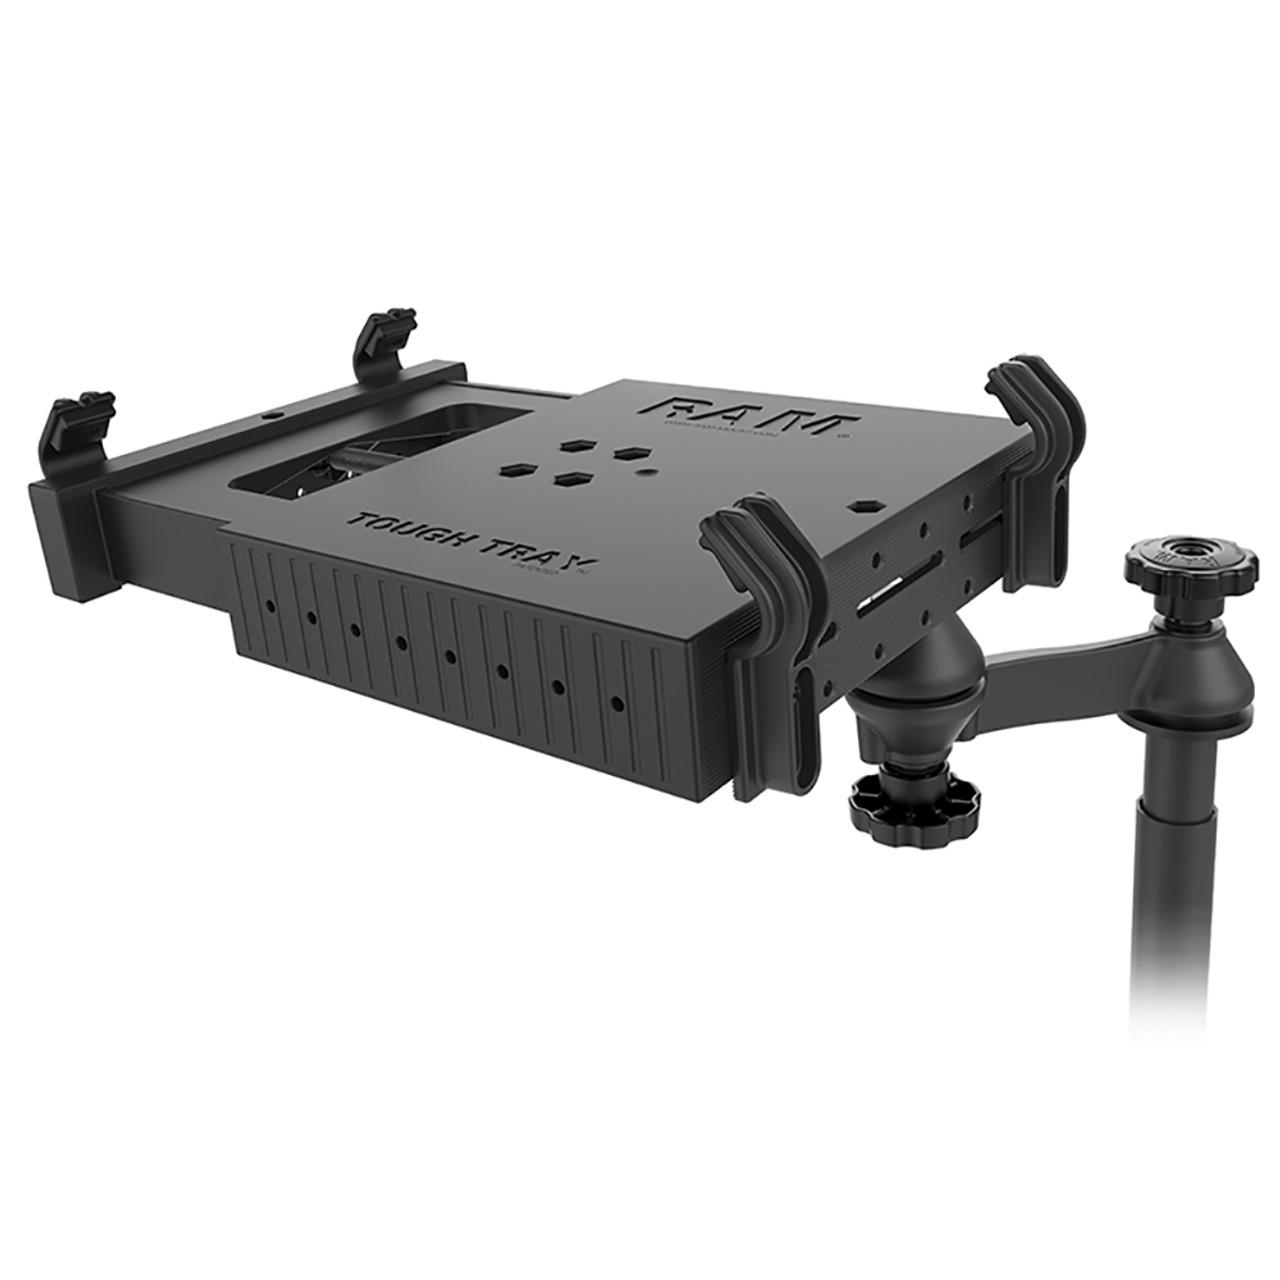 RAM Mount RAM No-Drill Laptop Mount f\/20-21 Ford Explorer [RAM-VB-202-A-SW1]